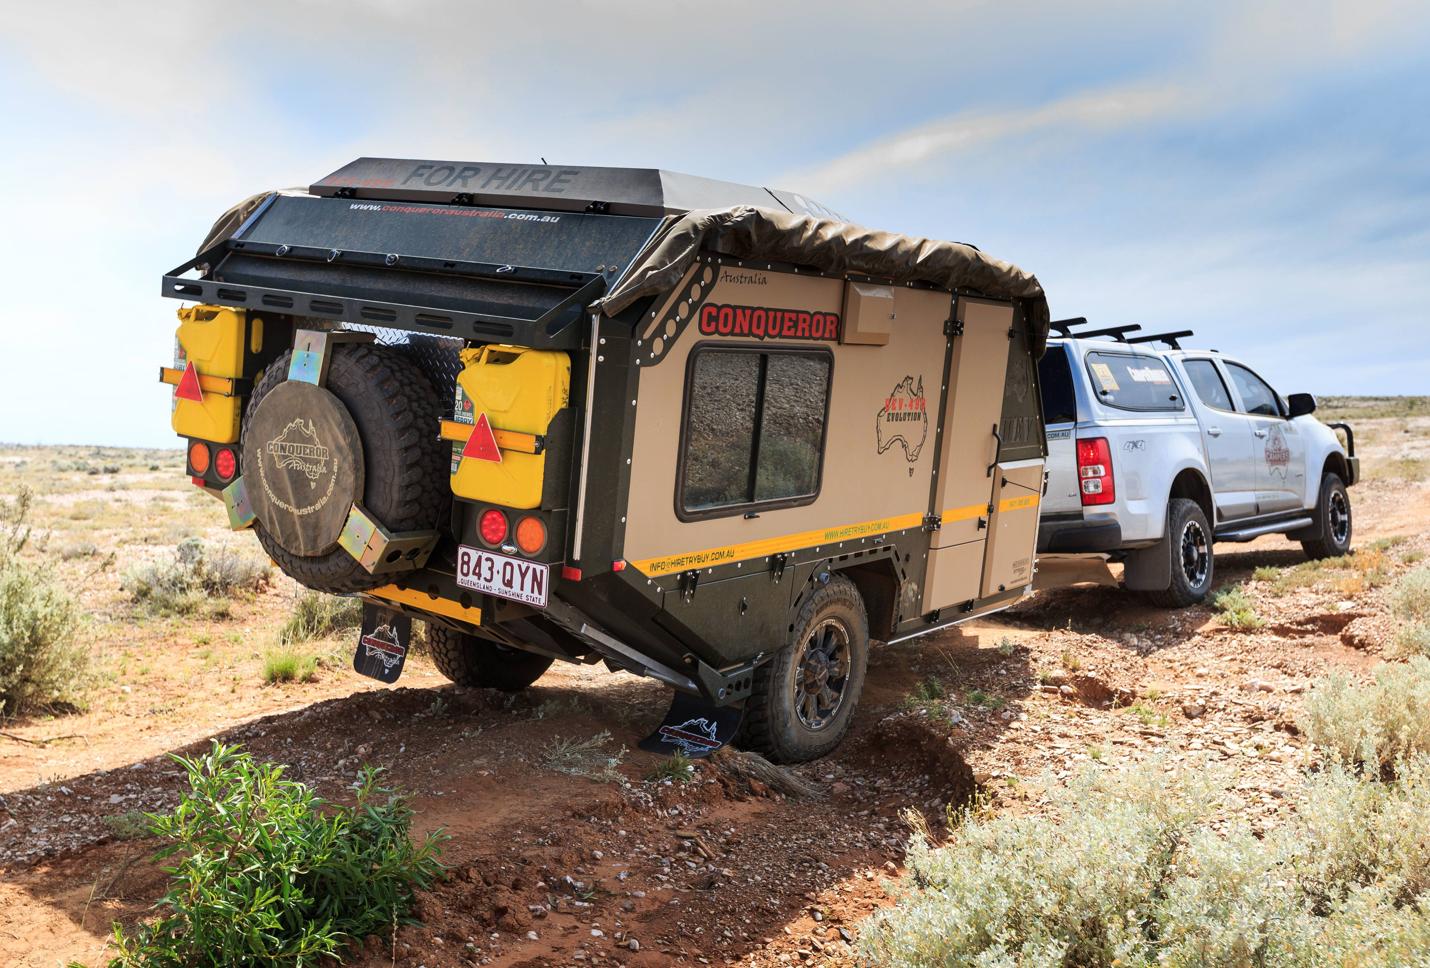 small travel trailers - conqueror overland drive